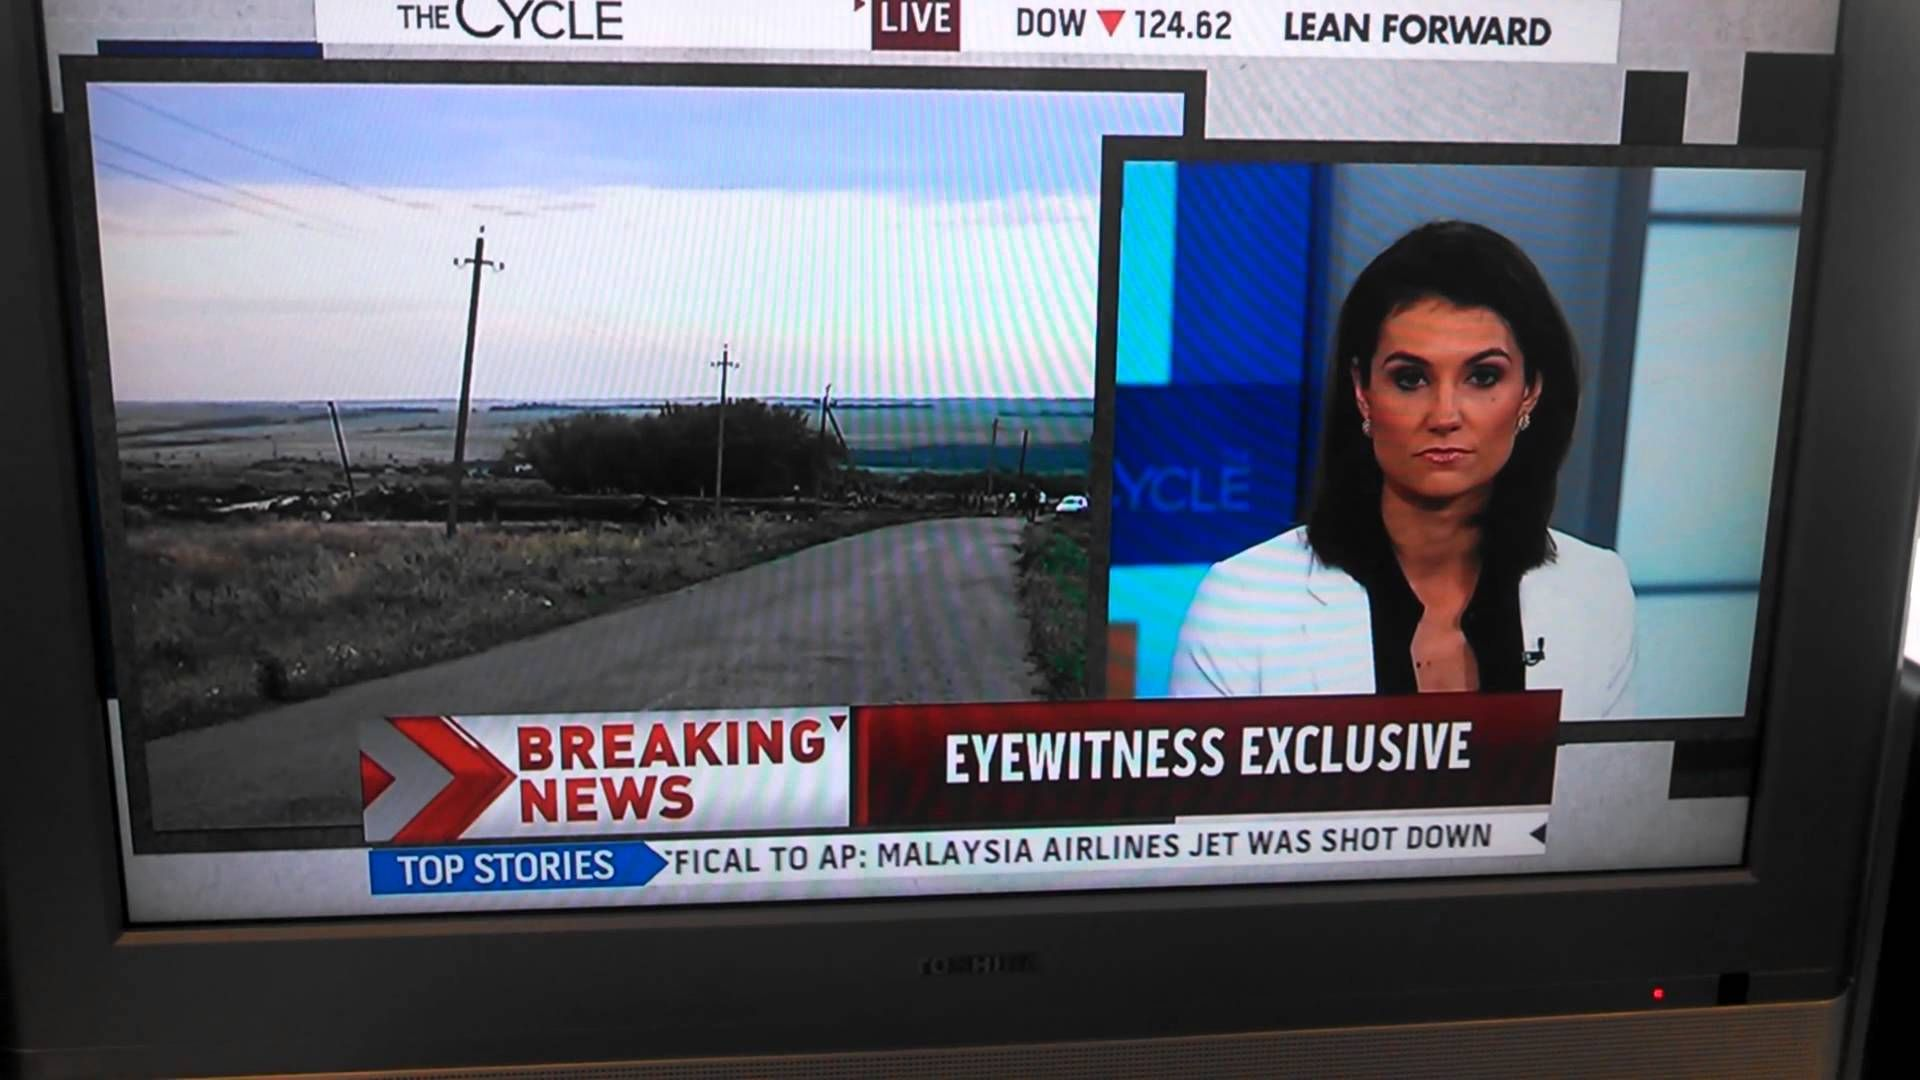 Howard Stern Prank Call Ukrainian Plane Crash On Msnbc Prank Calls Pranks Howard Stern